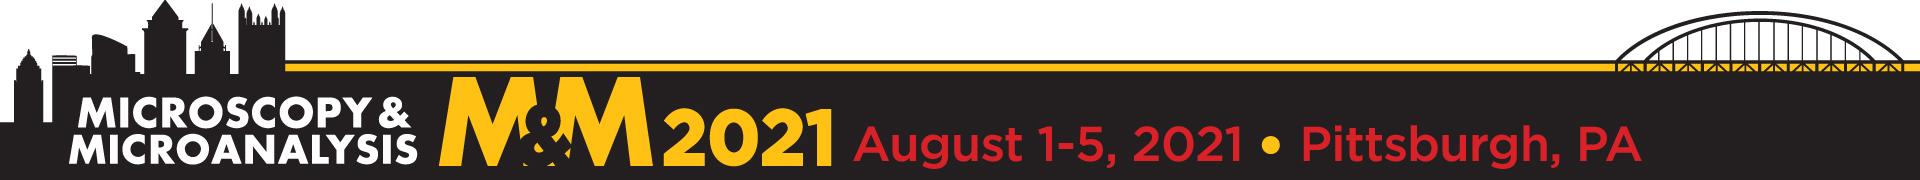 M&M 2021 Event Banner